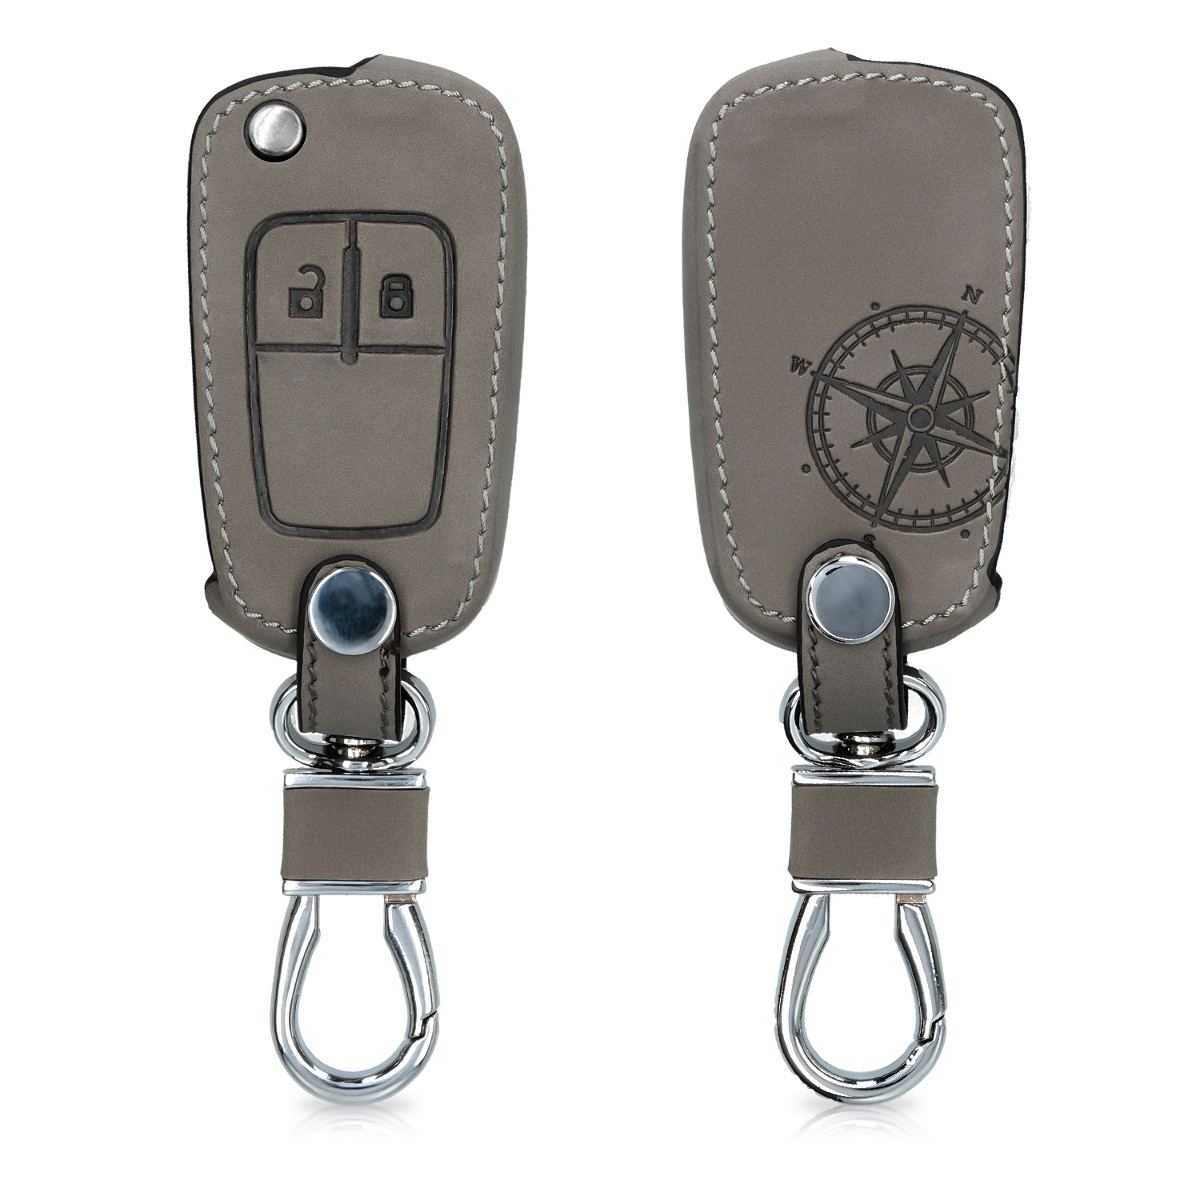 KW Θήκη Κλειδιού Opel / Chevrolet - Συνθετικό Δέρμα - 2 Κουμπιά - Grey (49939.01)